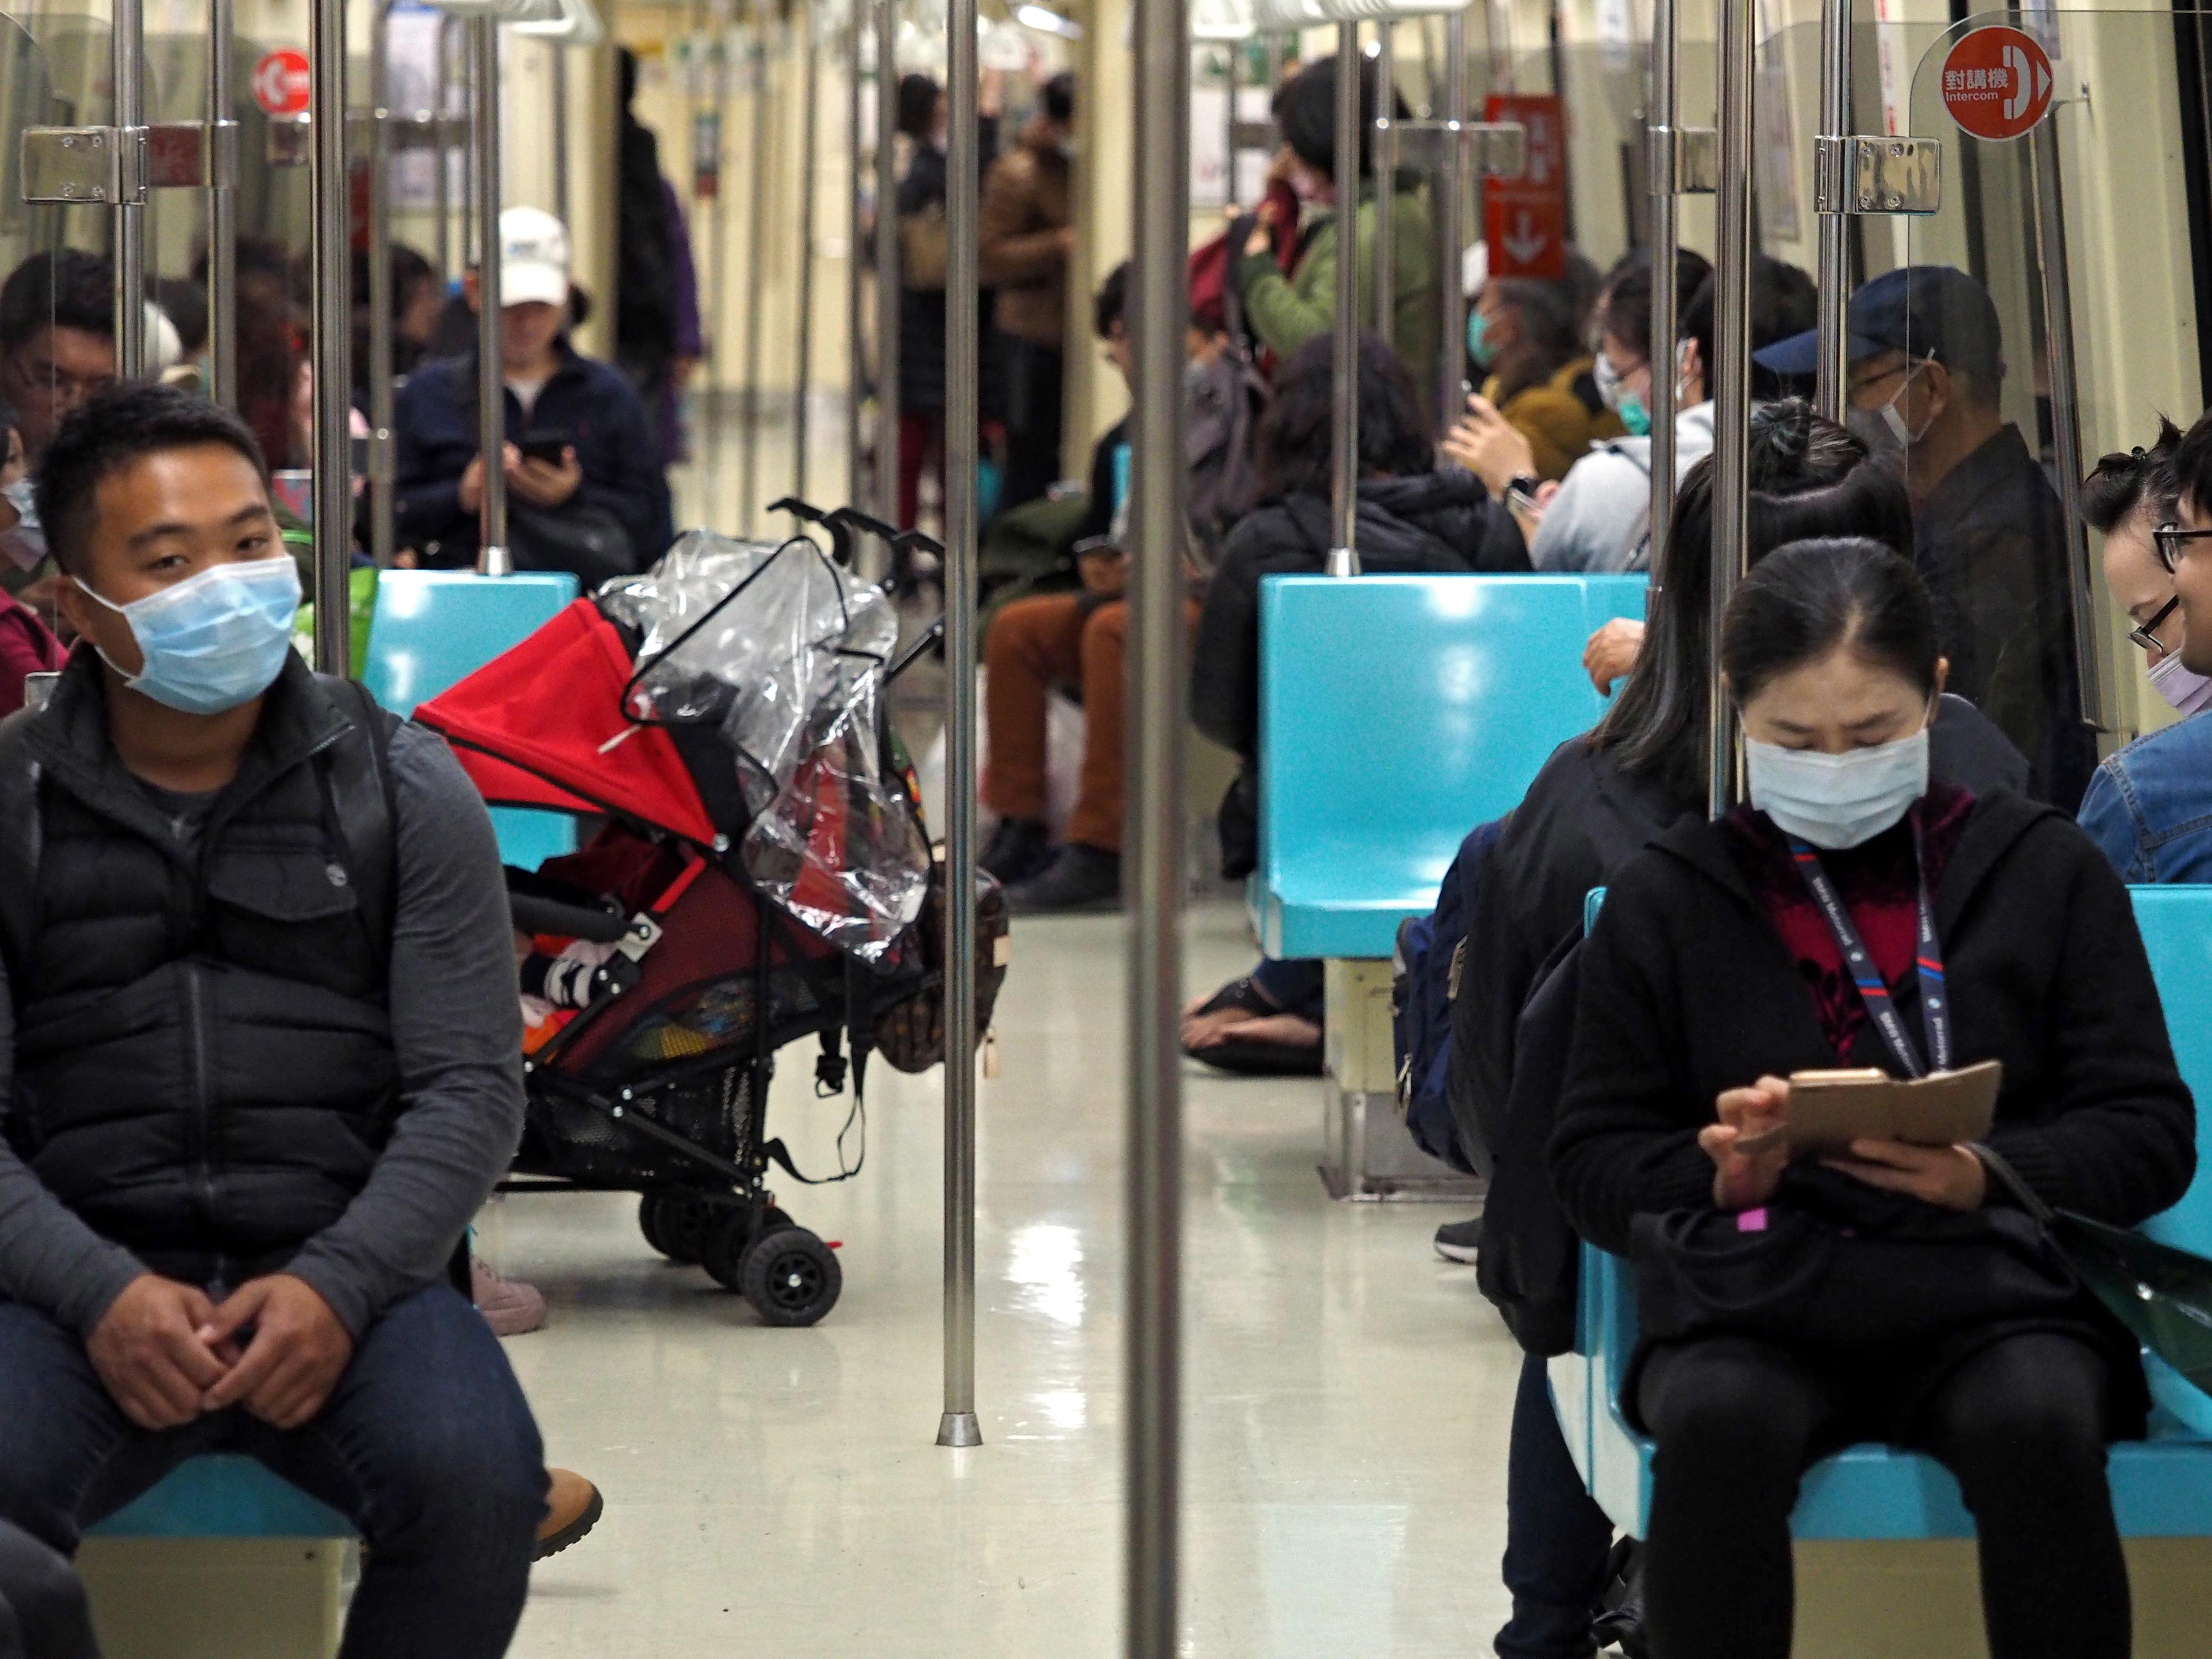 Coronavírus causa 1.129 novos casos e provoca 30 mortos desde sexta-feira - ECDC